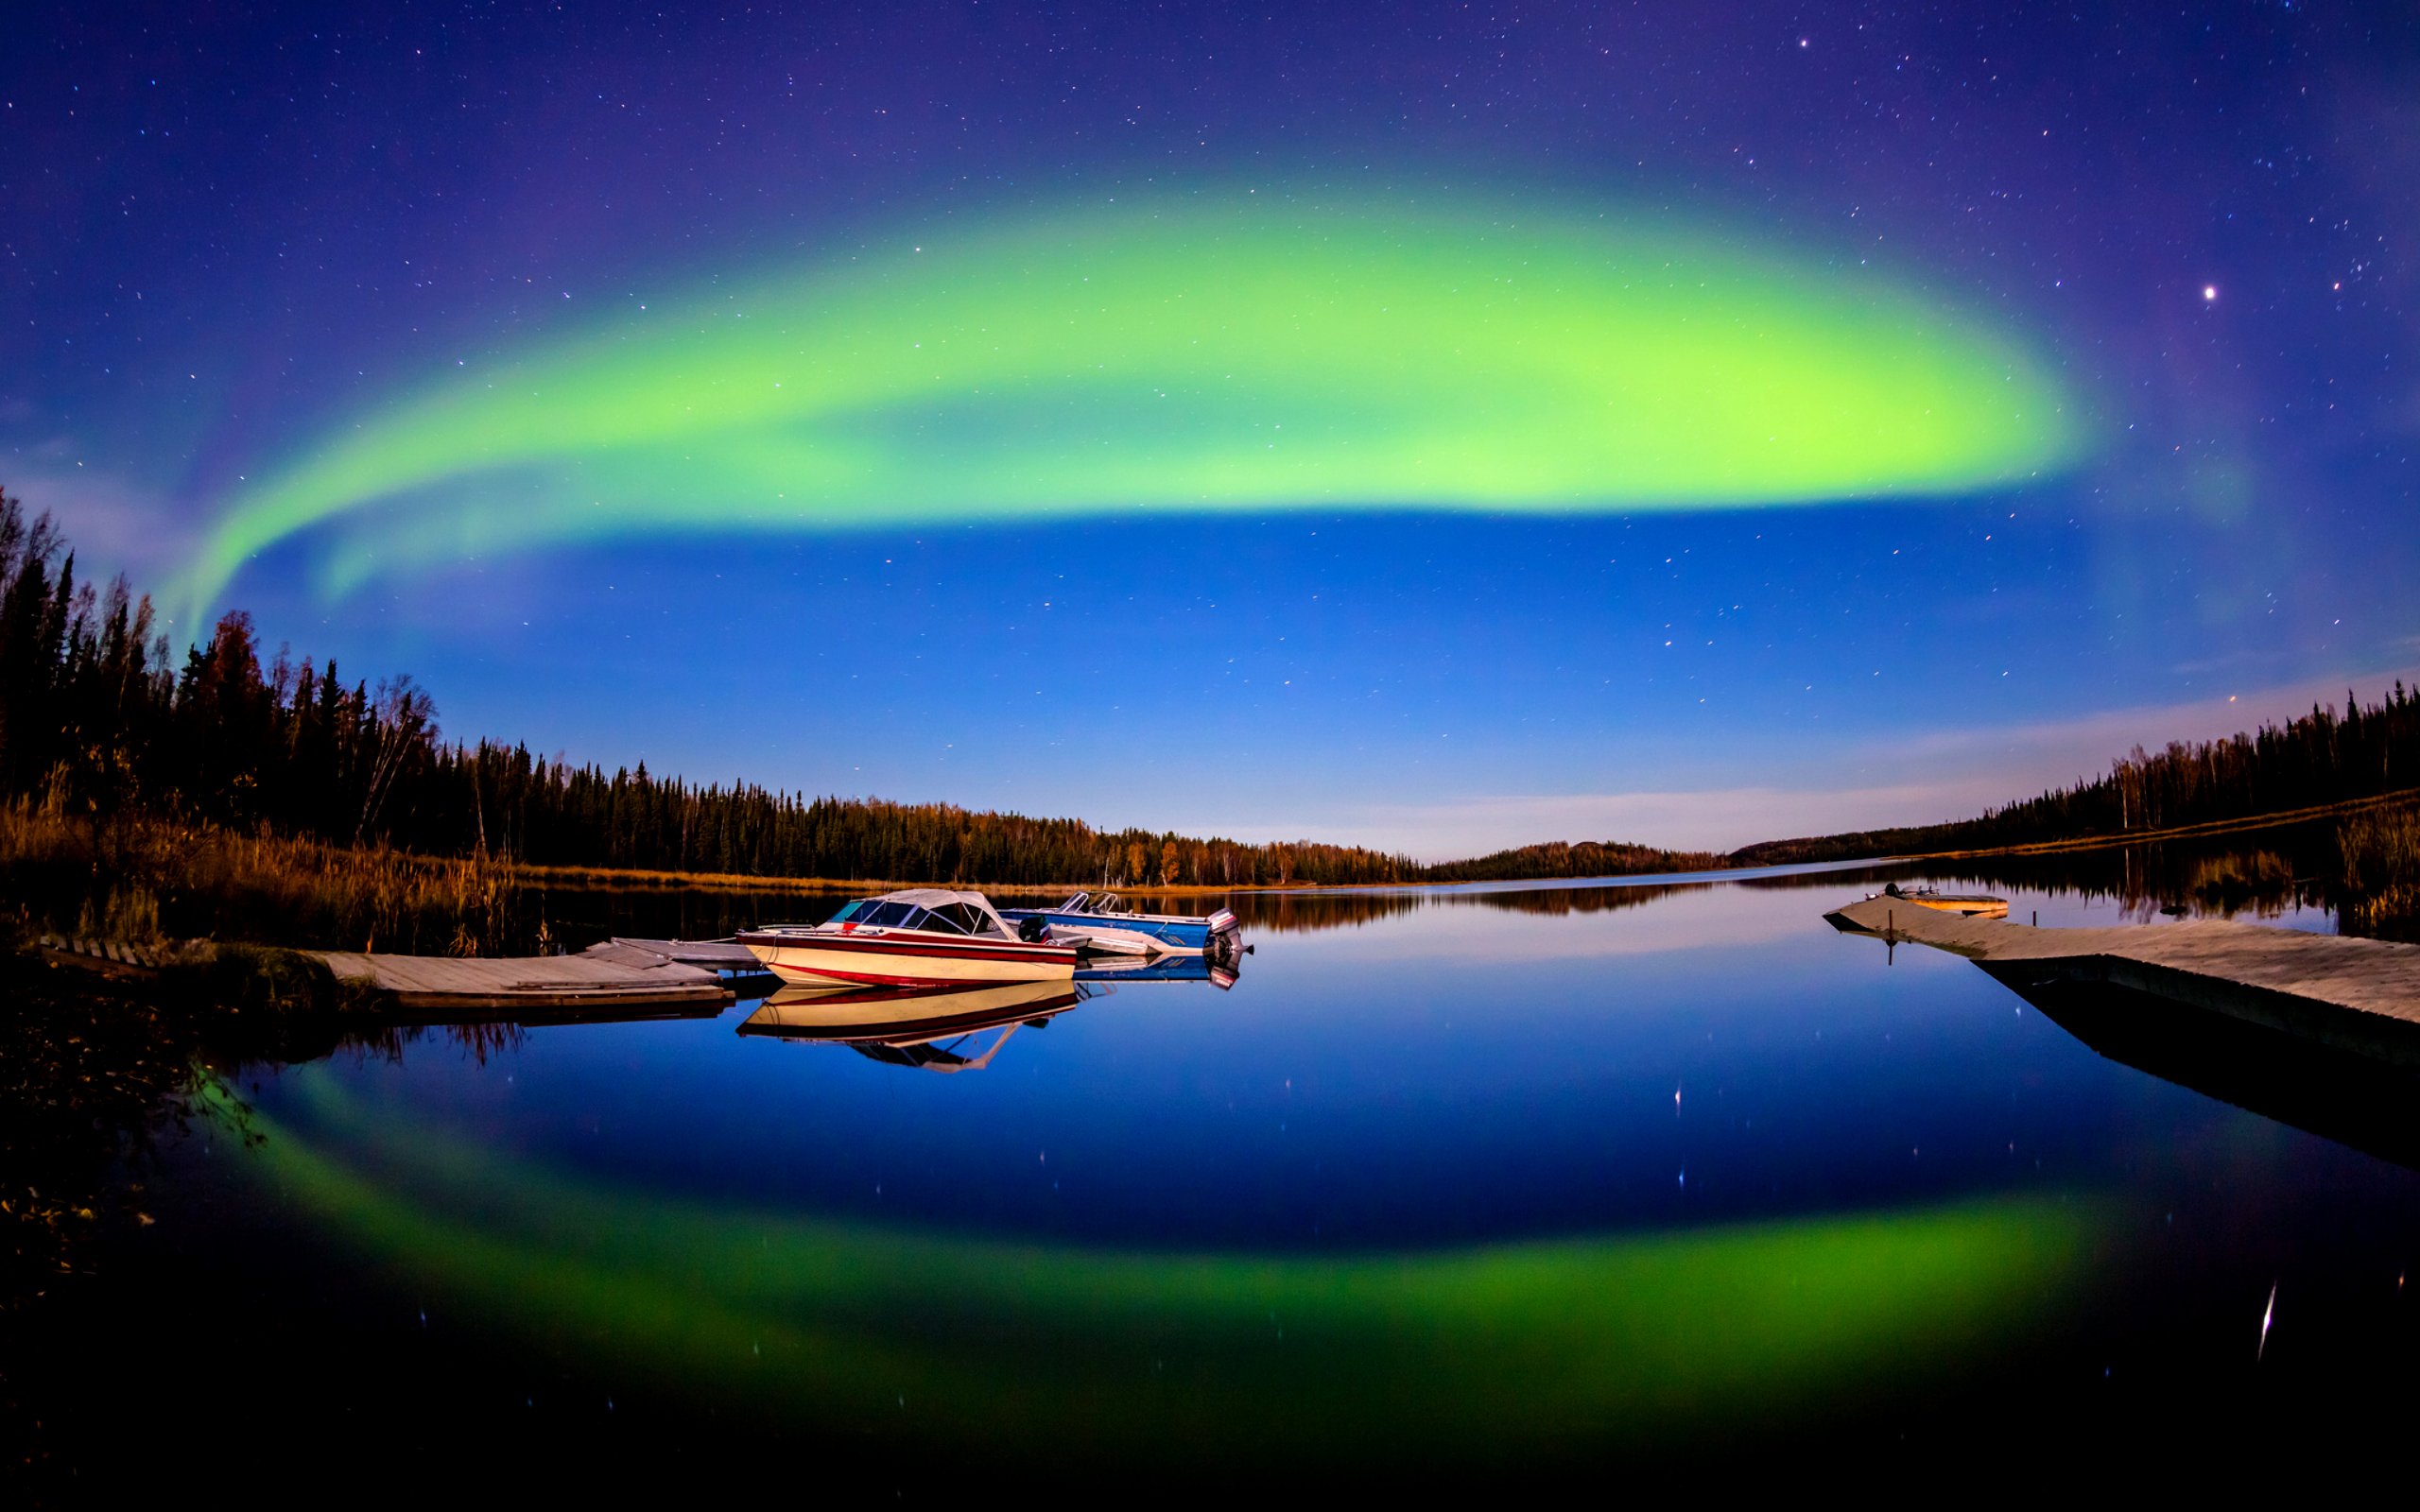 Aurora Borealis Wallpaper Widescreen   HD Wallpapers 2560x1600